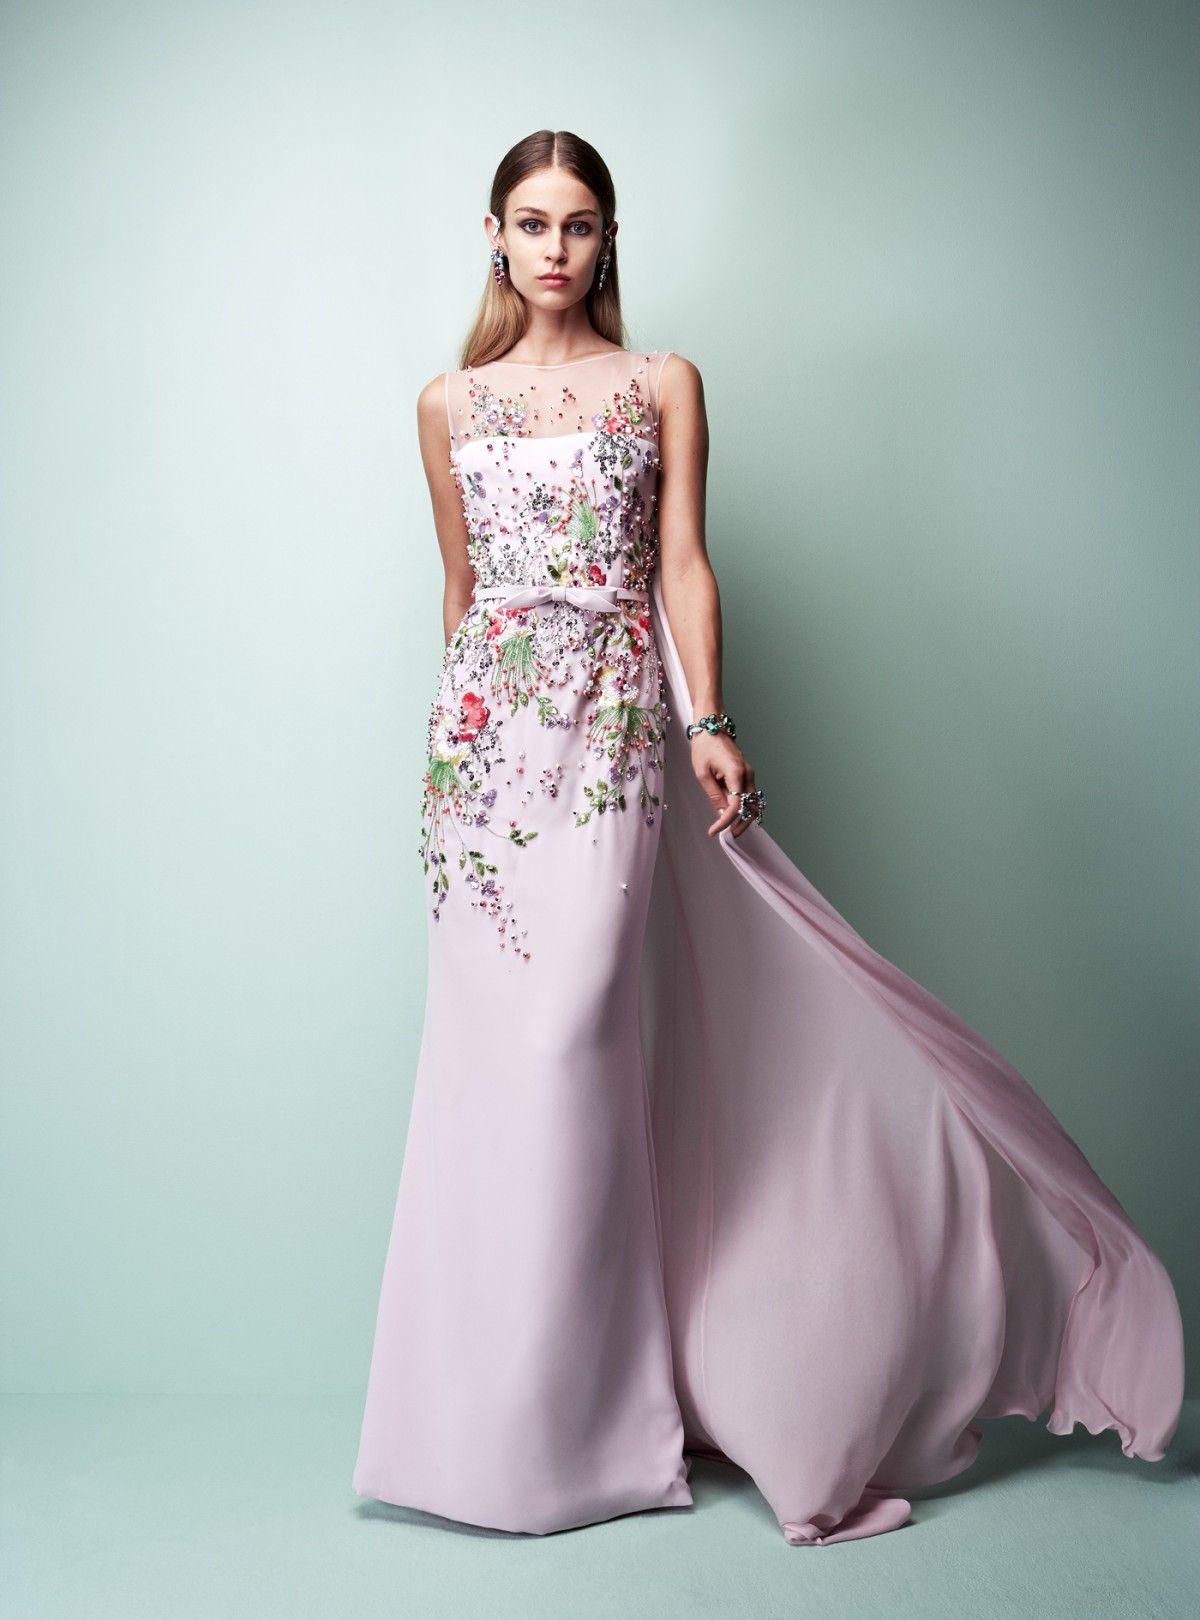 بالصور موديلات فساتين سواريه , تصميمات فستان سواريه 5086 1